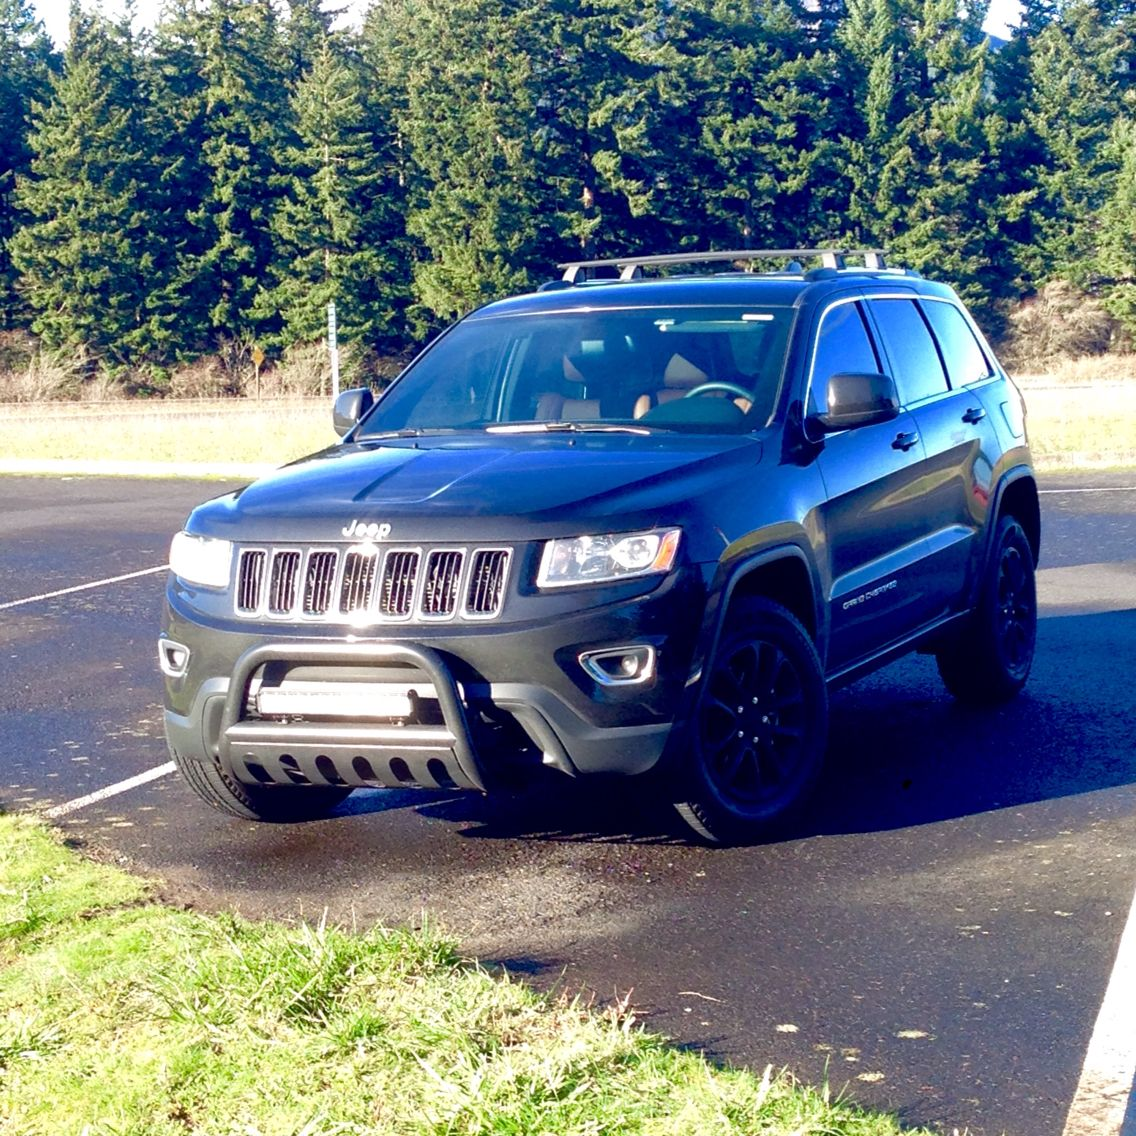 medium resolution of 2014 jeep grand cherokee wk2 light bar bull bar brush guard plastidip black wheels